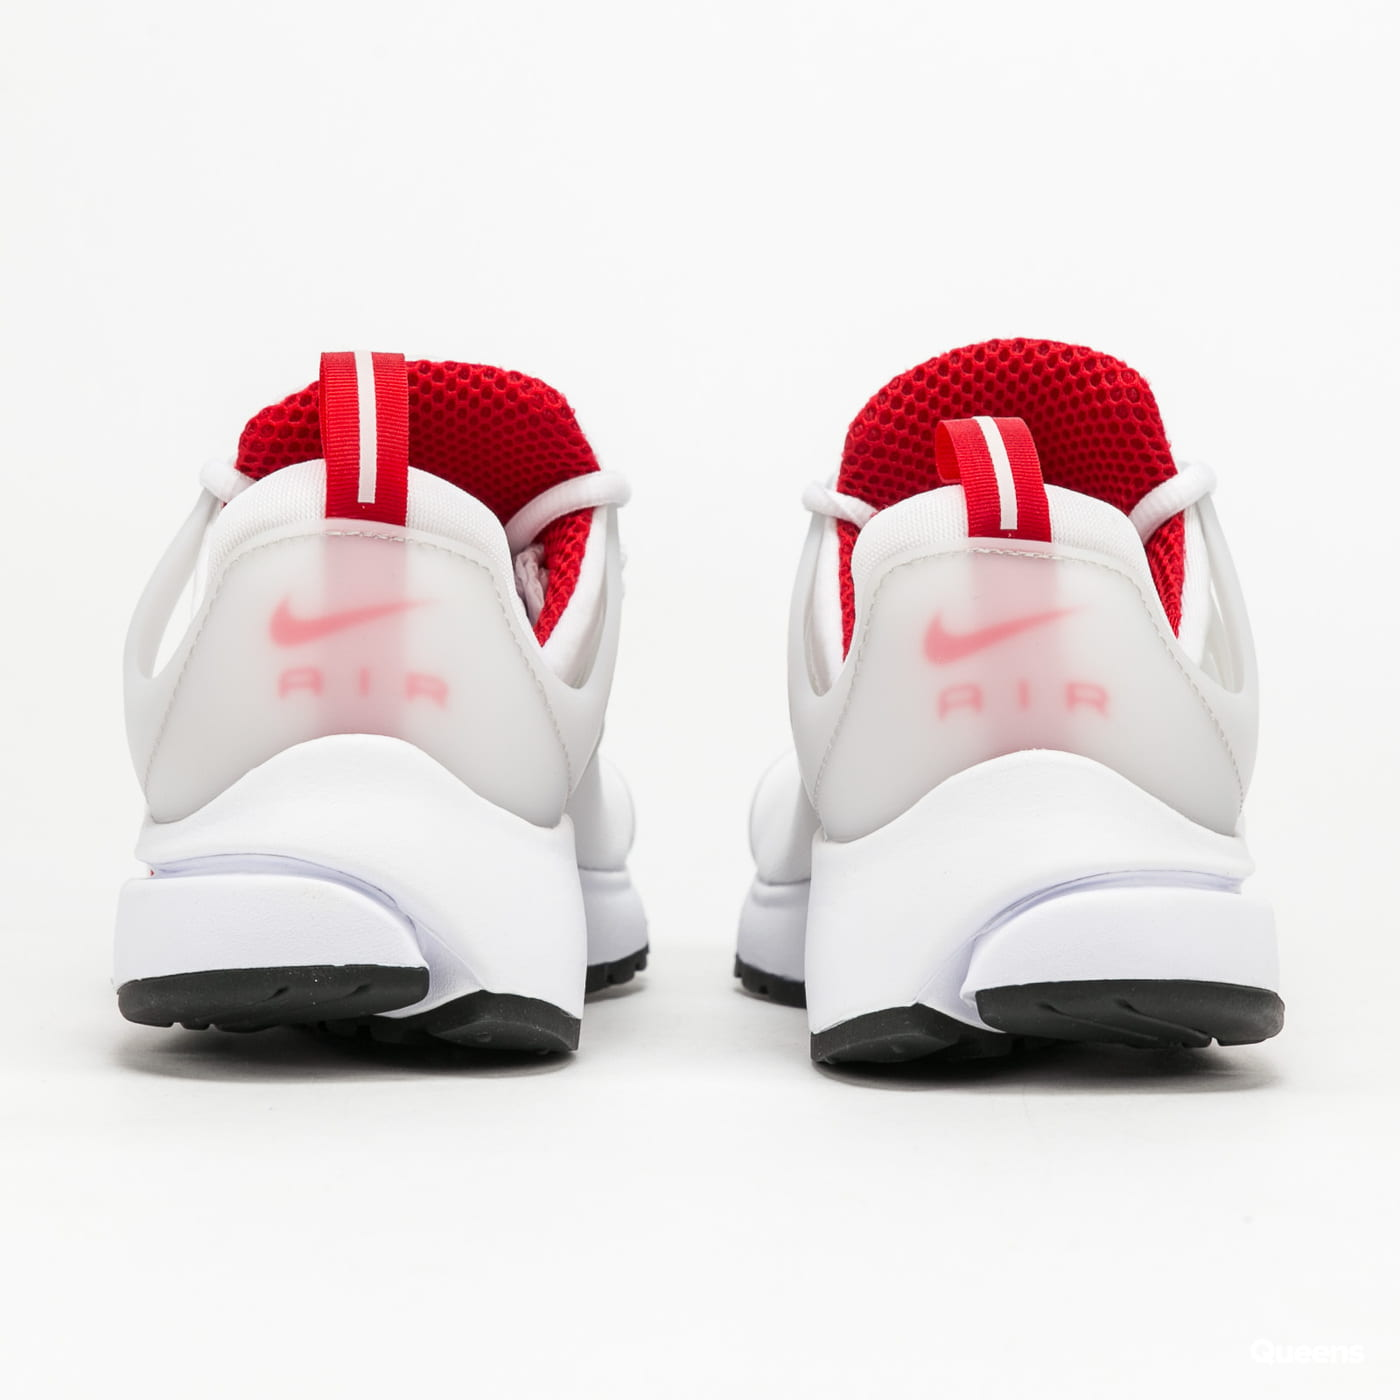 Nike Air Presto white / pure platinum